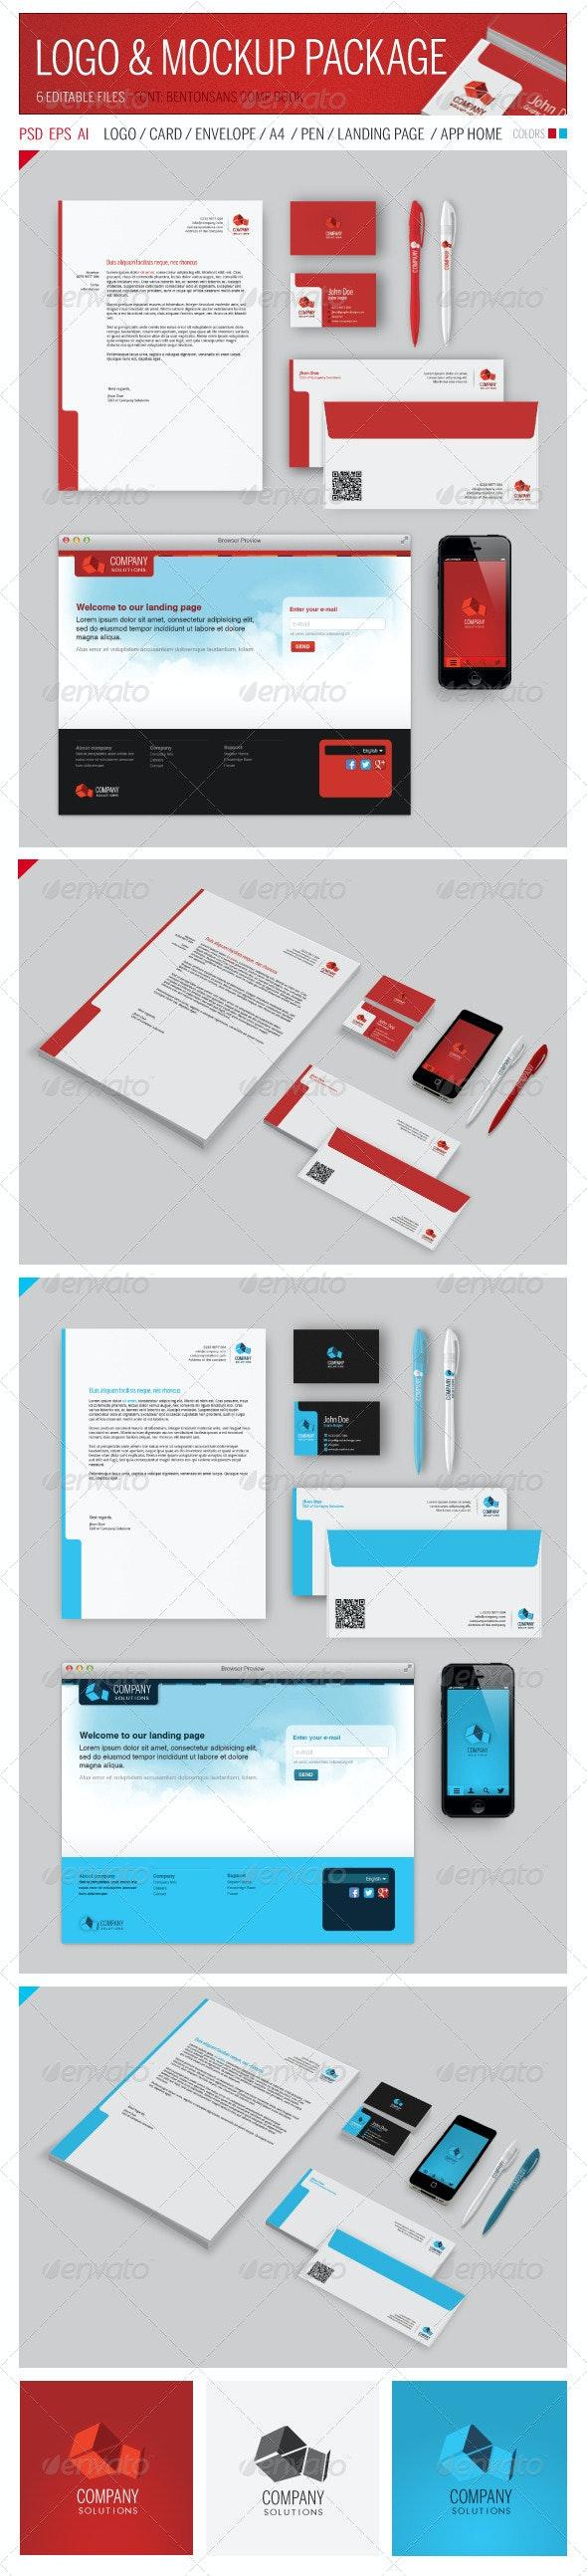 Logo & Mockup Package - Print Product Mock-Ups